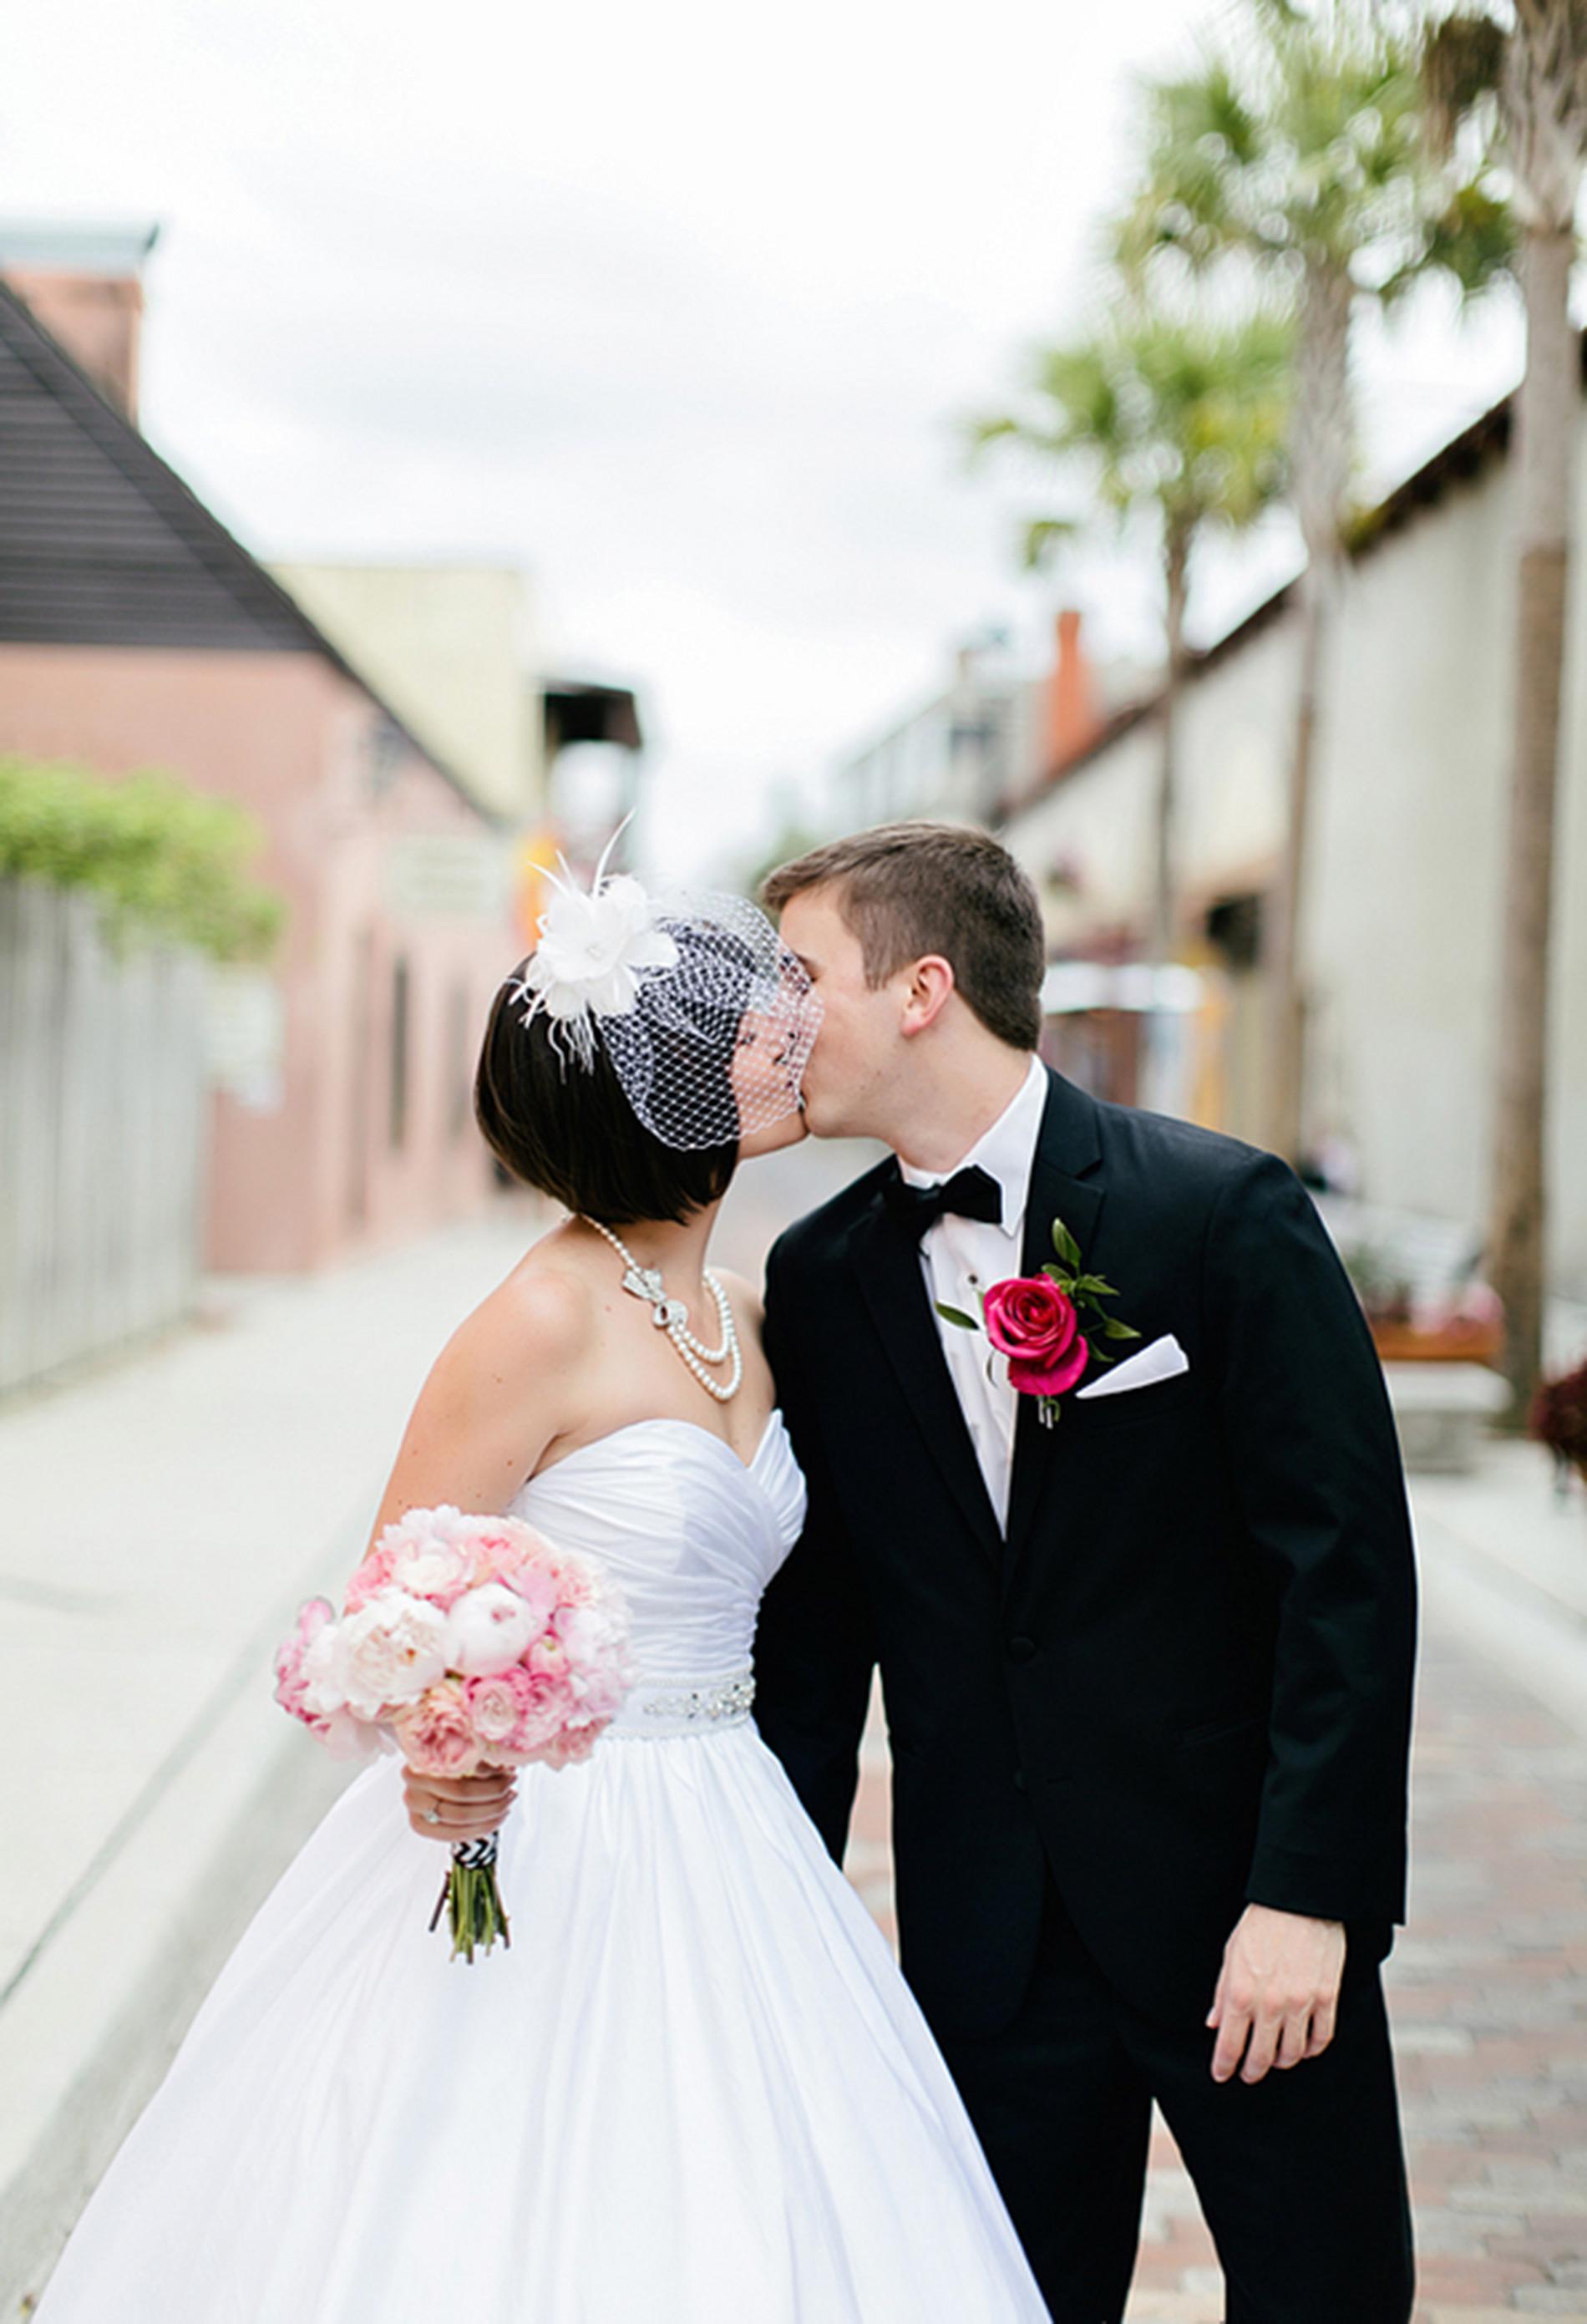 st-augustine-bride-and-groom